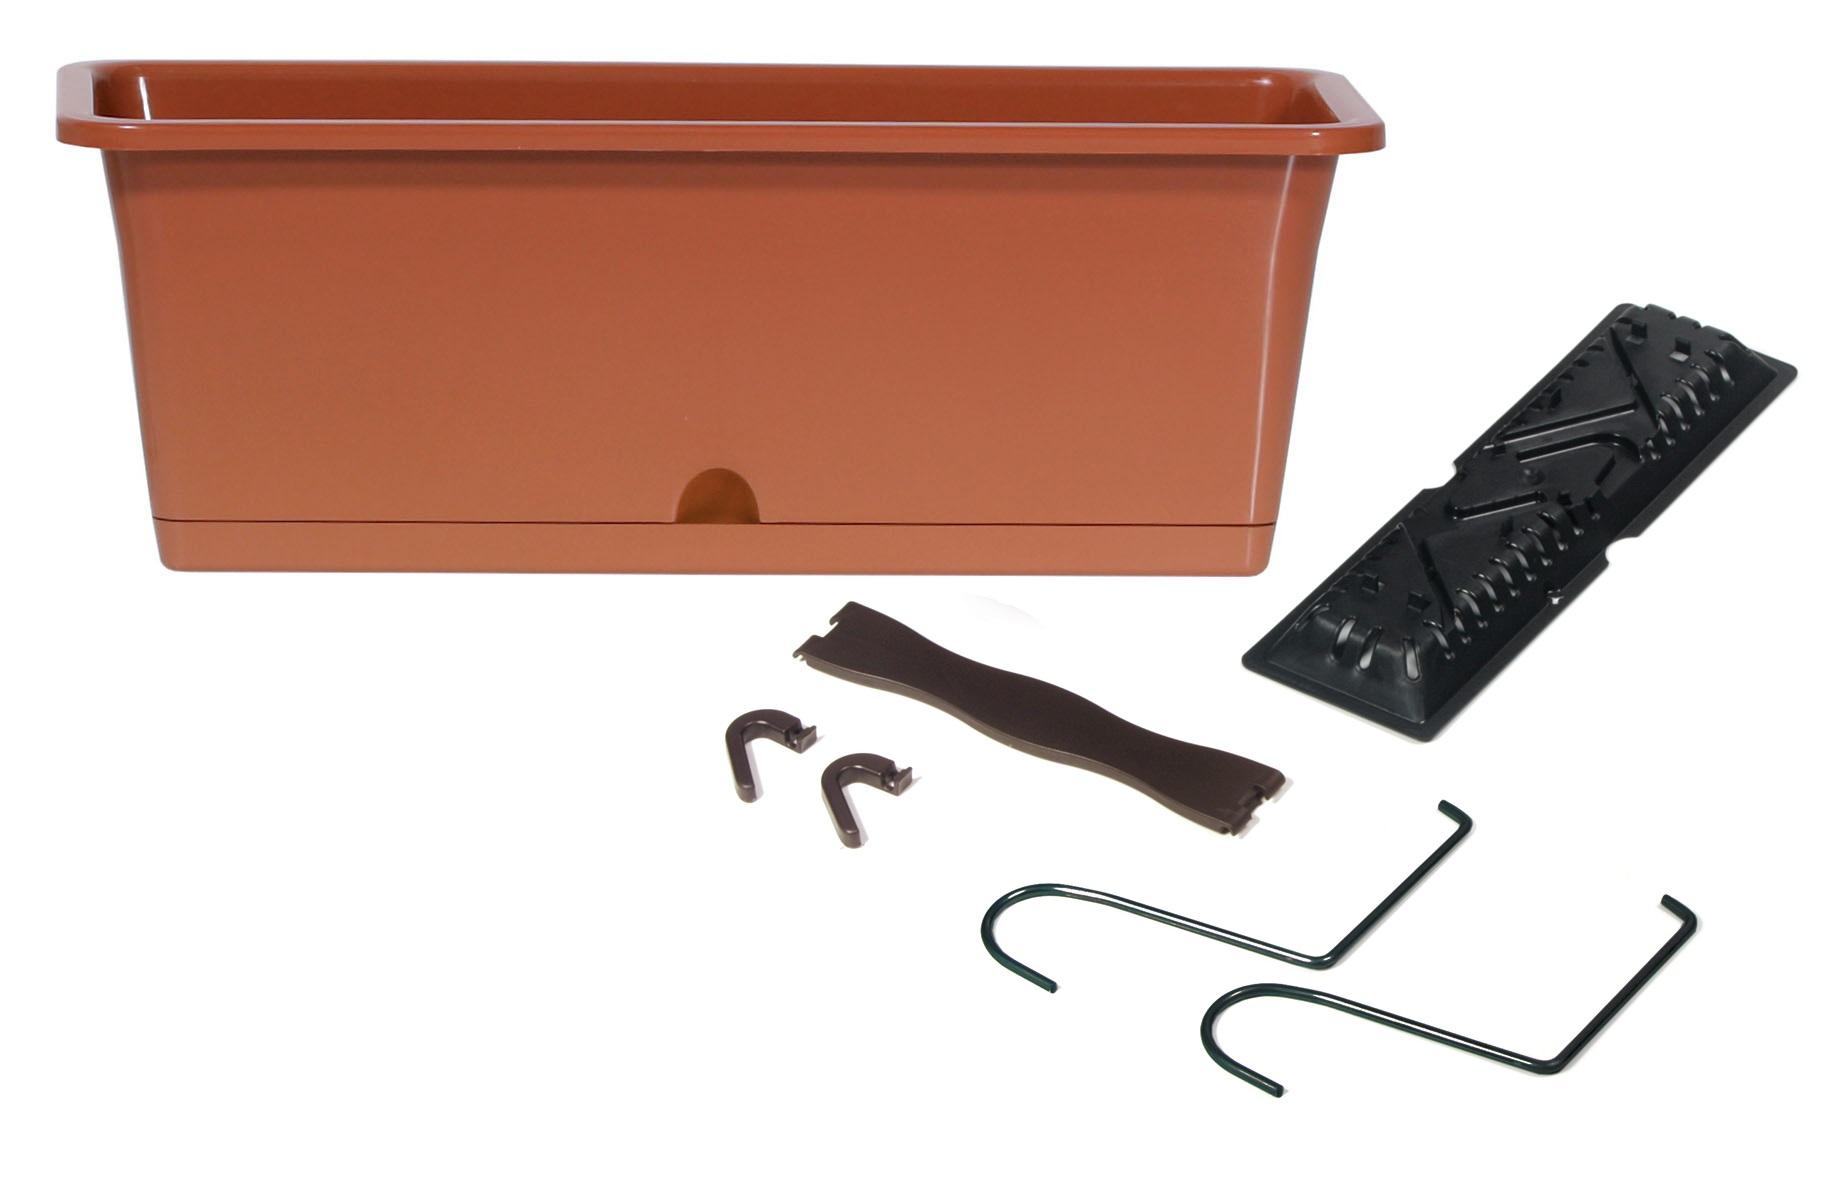 PROSPERPLAST Truhlík CAMELIA W s háky terakota 40,2cm